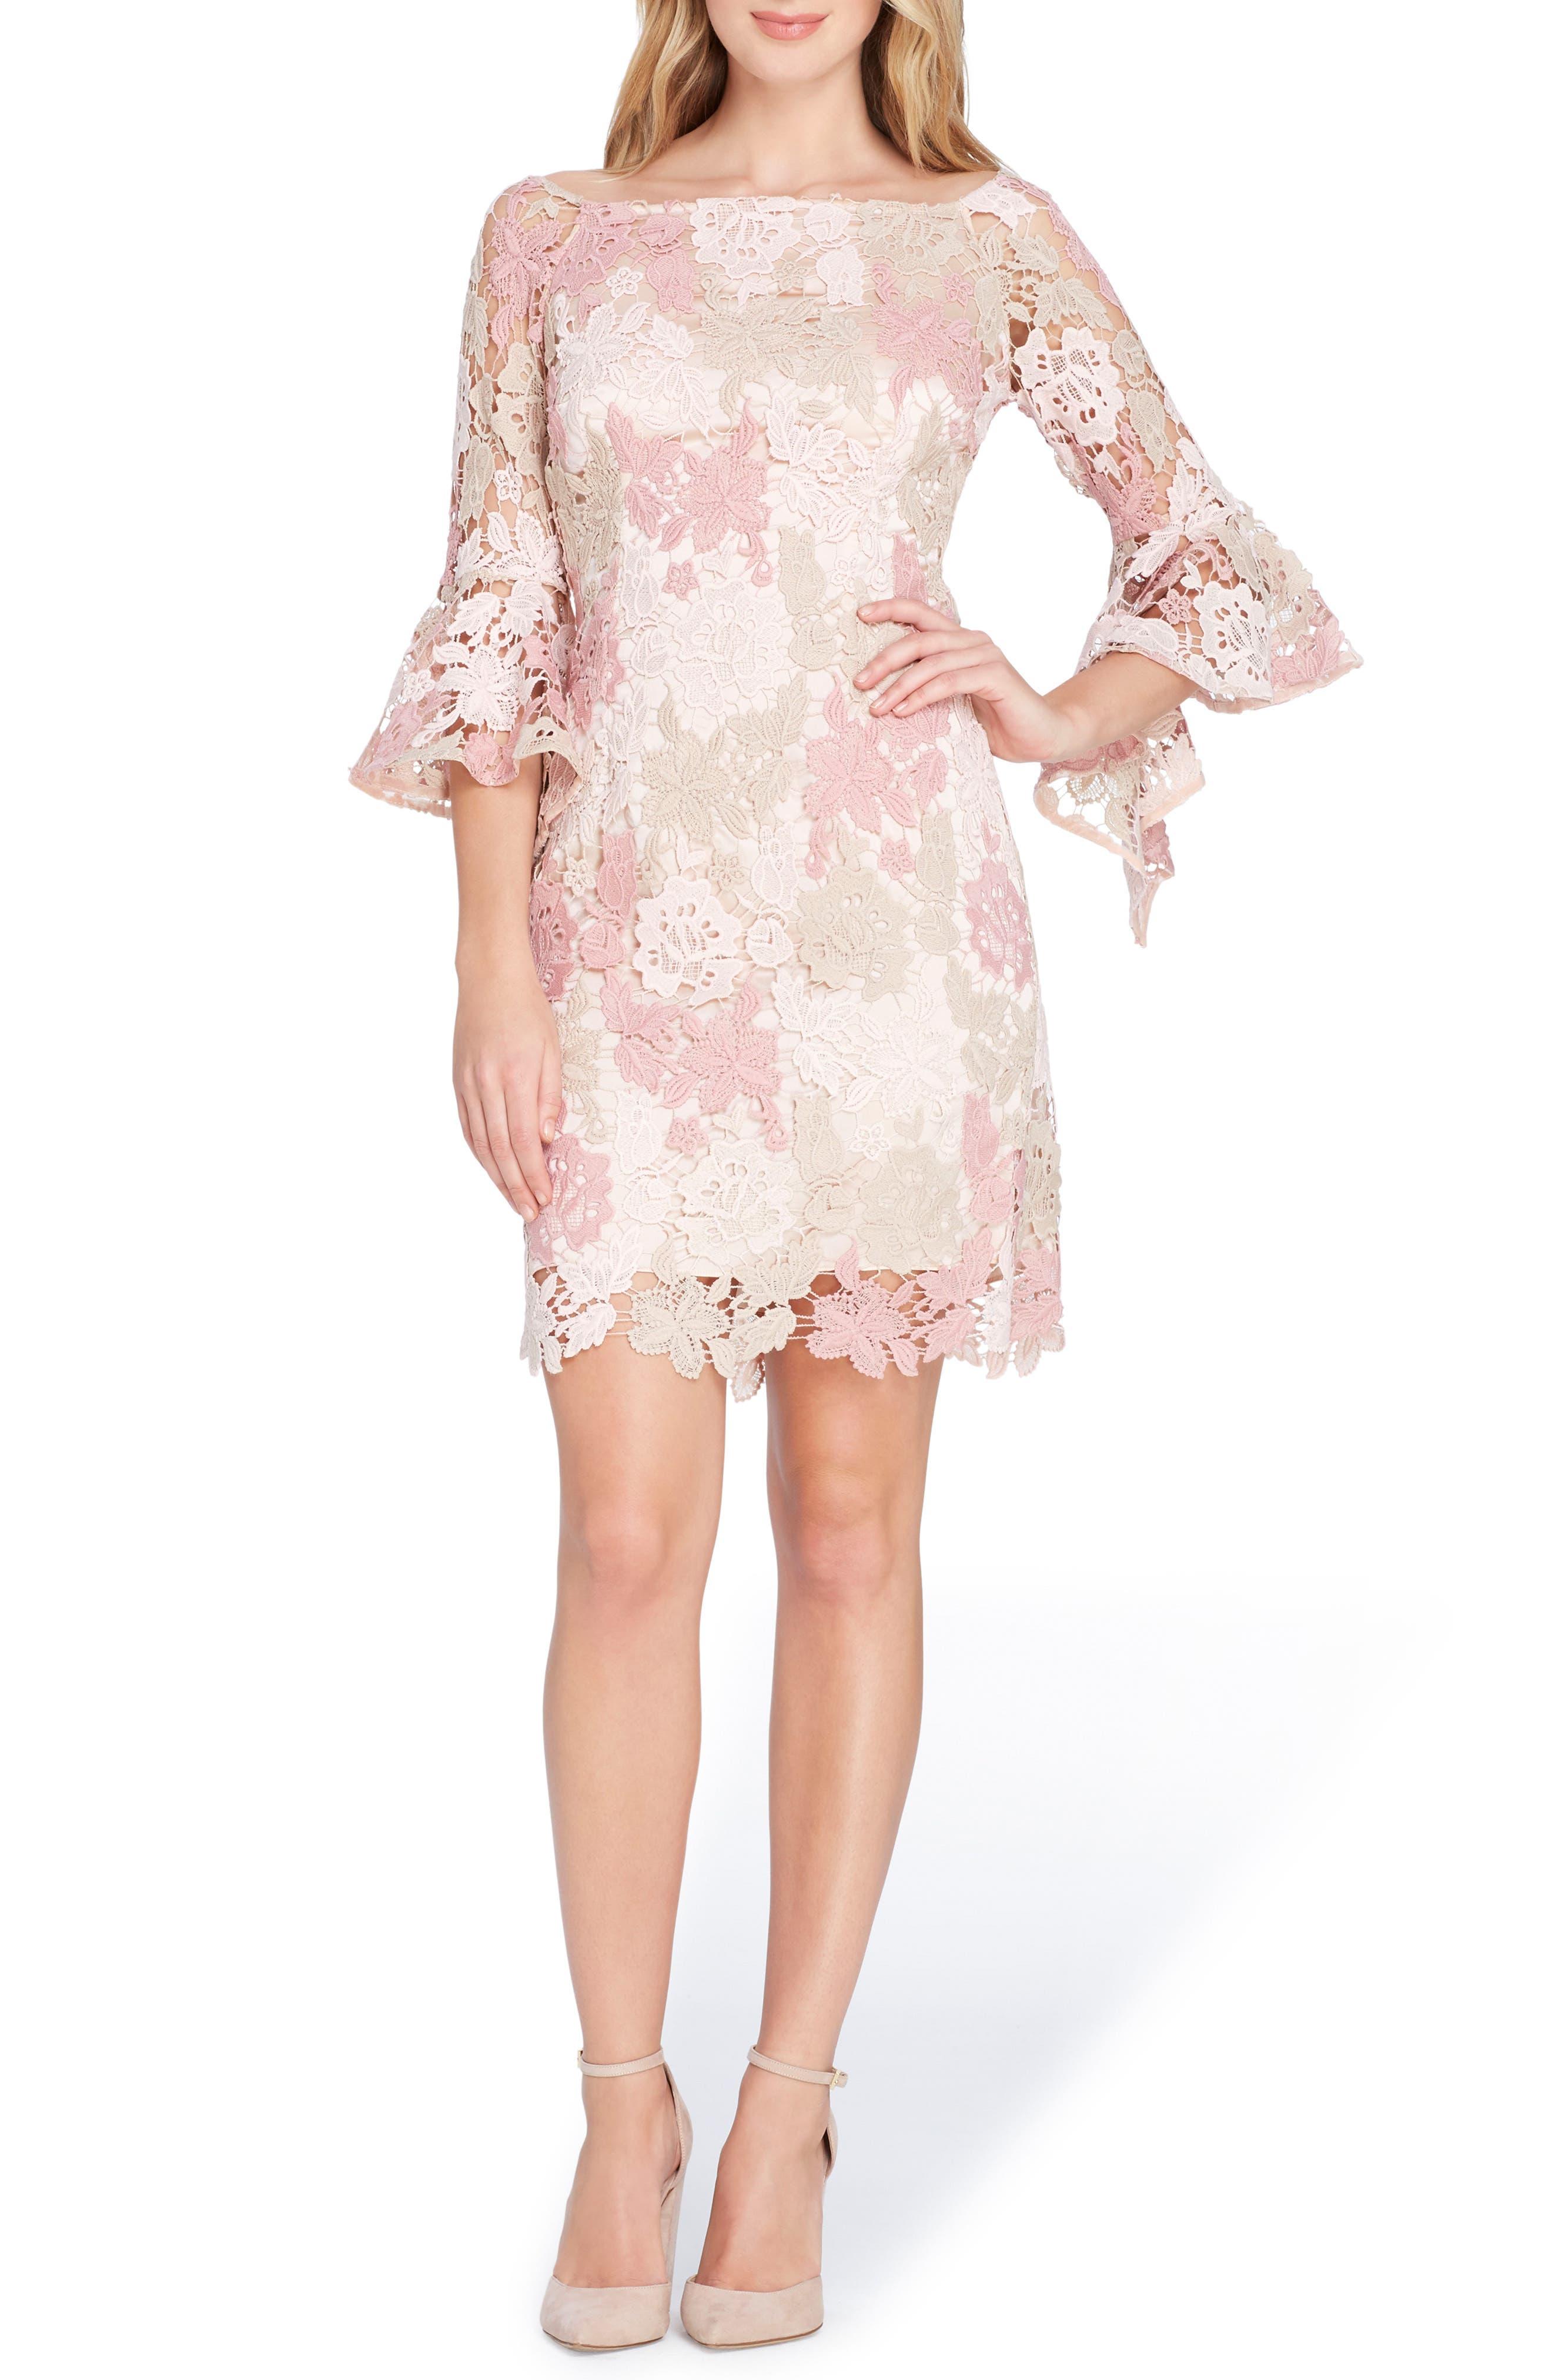 Lace Bell Sleeve Sheath Dress,                             Main thumbnail 1, color,                             Blush/ Rose/ Taupe